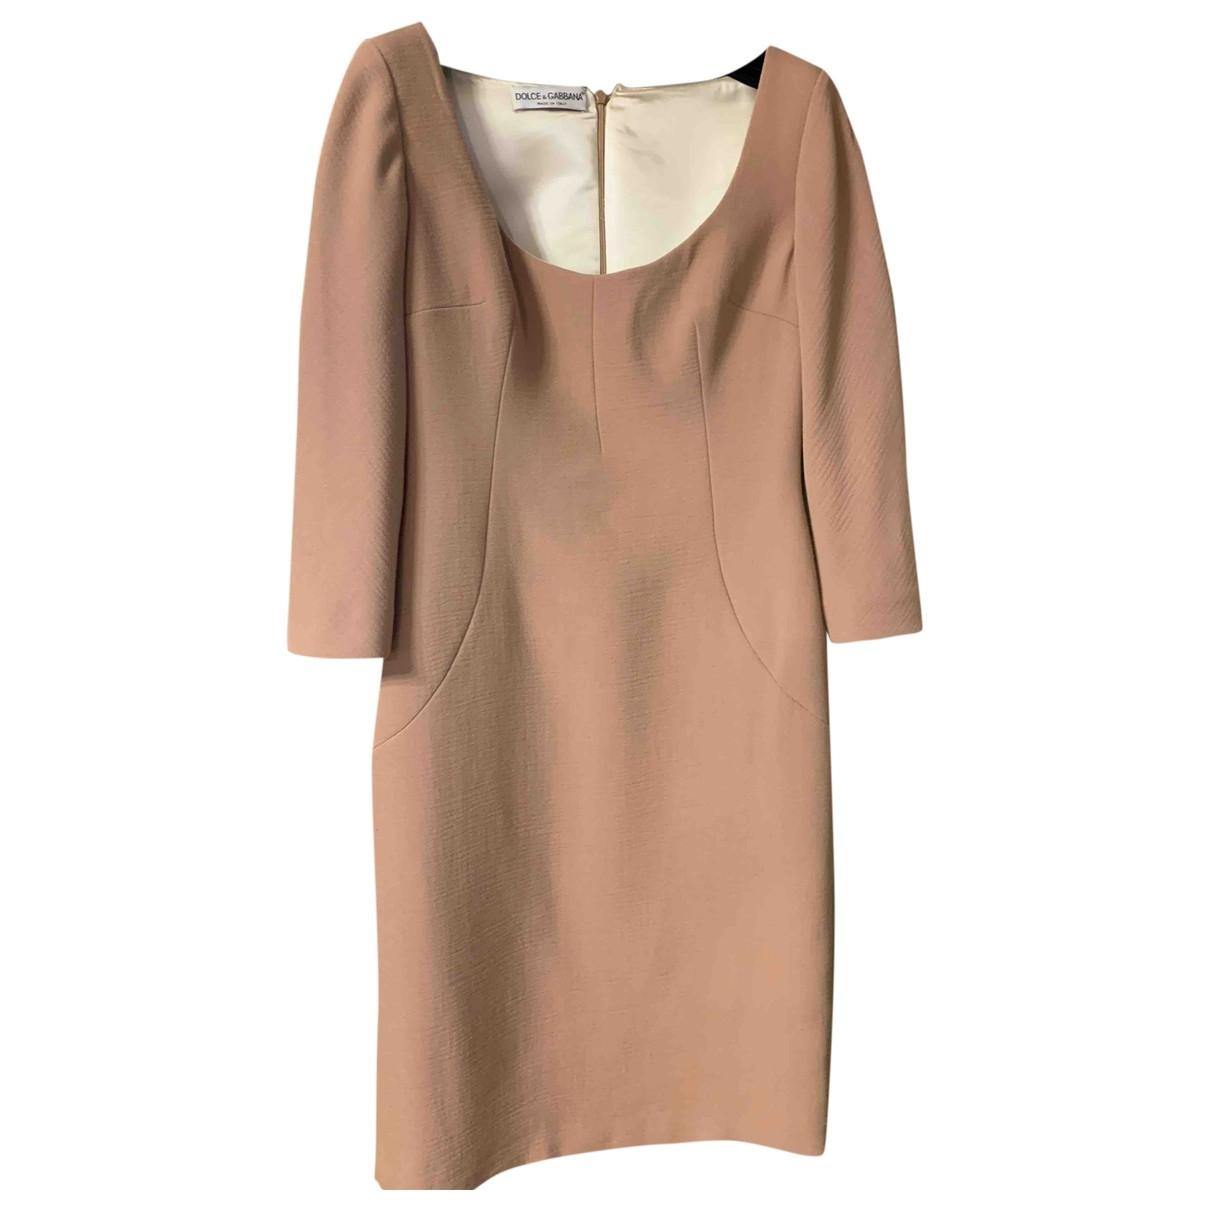 Dolce & Gabbana \N Kleid in  Beige Wolle